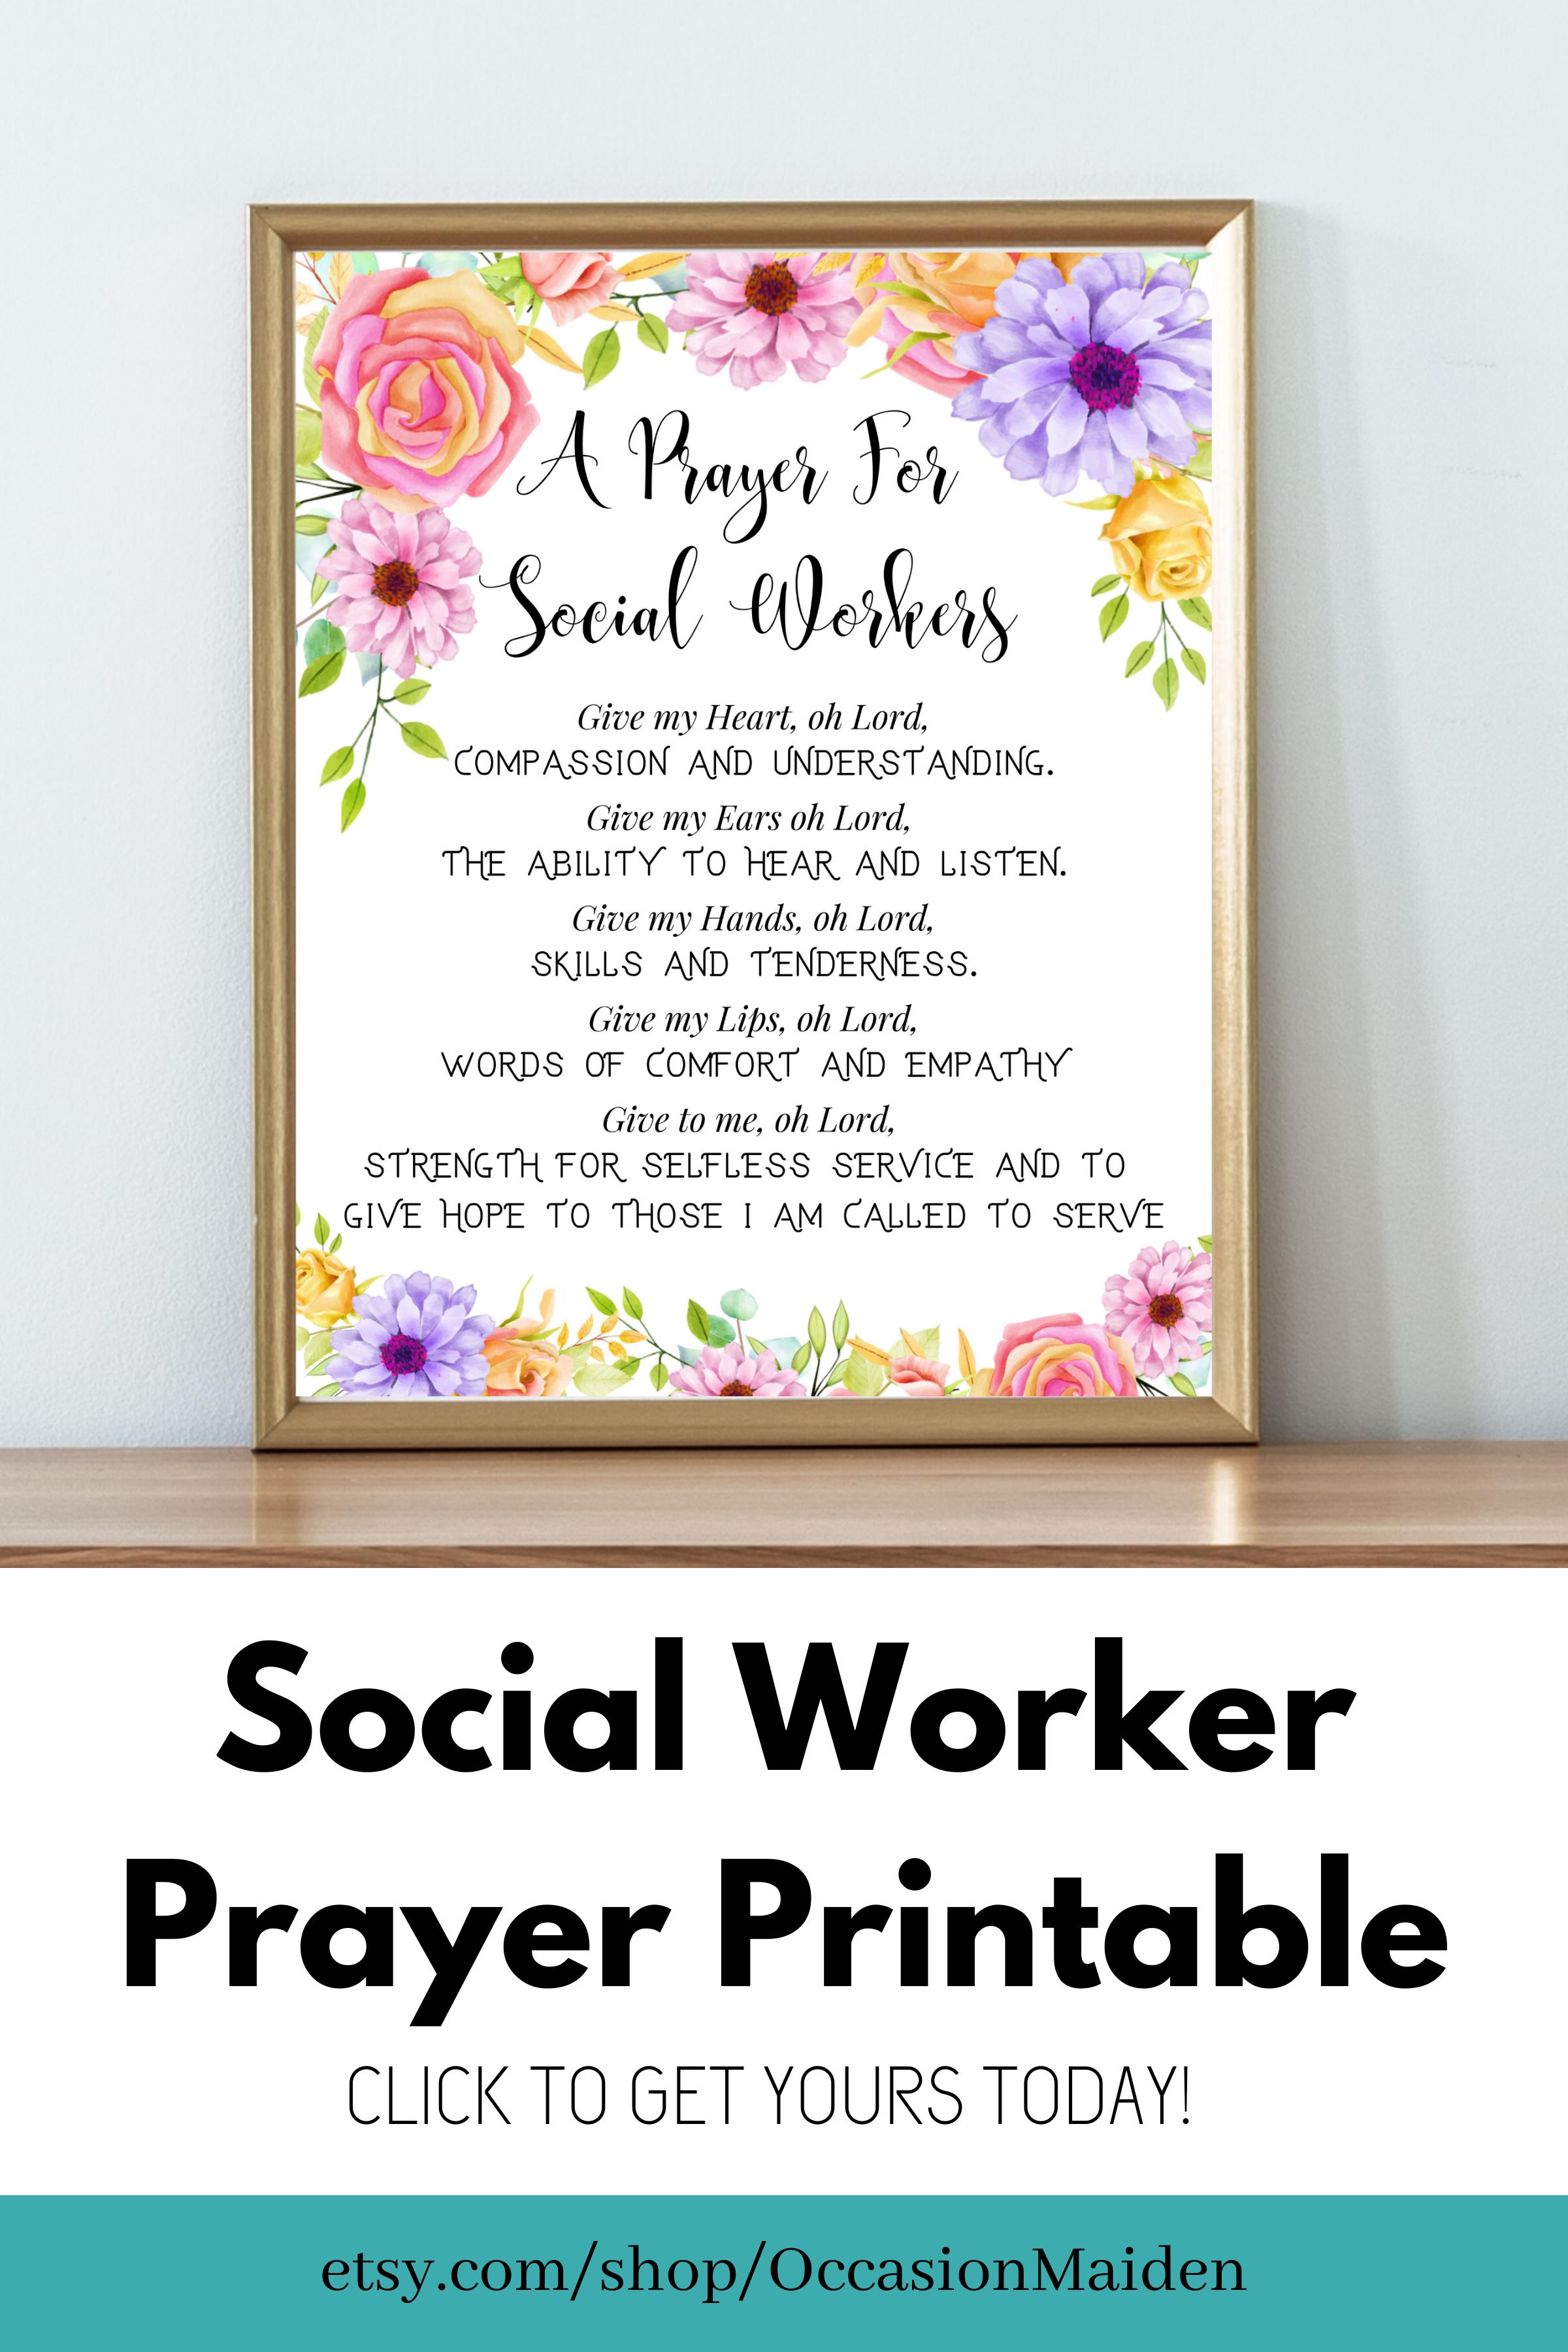 Masters Of Social Work Gift Social Work Poster Prayer Social Worker Office Decor School Social Work Desk Wall Art Msw Gifts Caseworker Bsw Social Worker Office Decor Office Gifts Supervisor Gifts